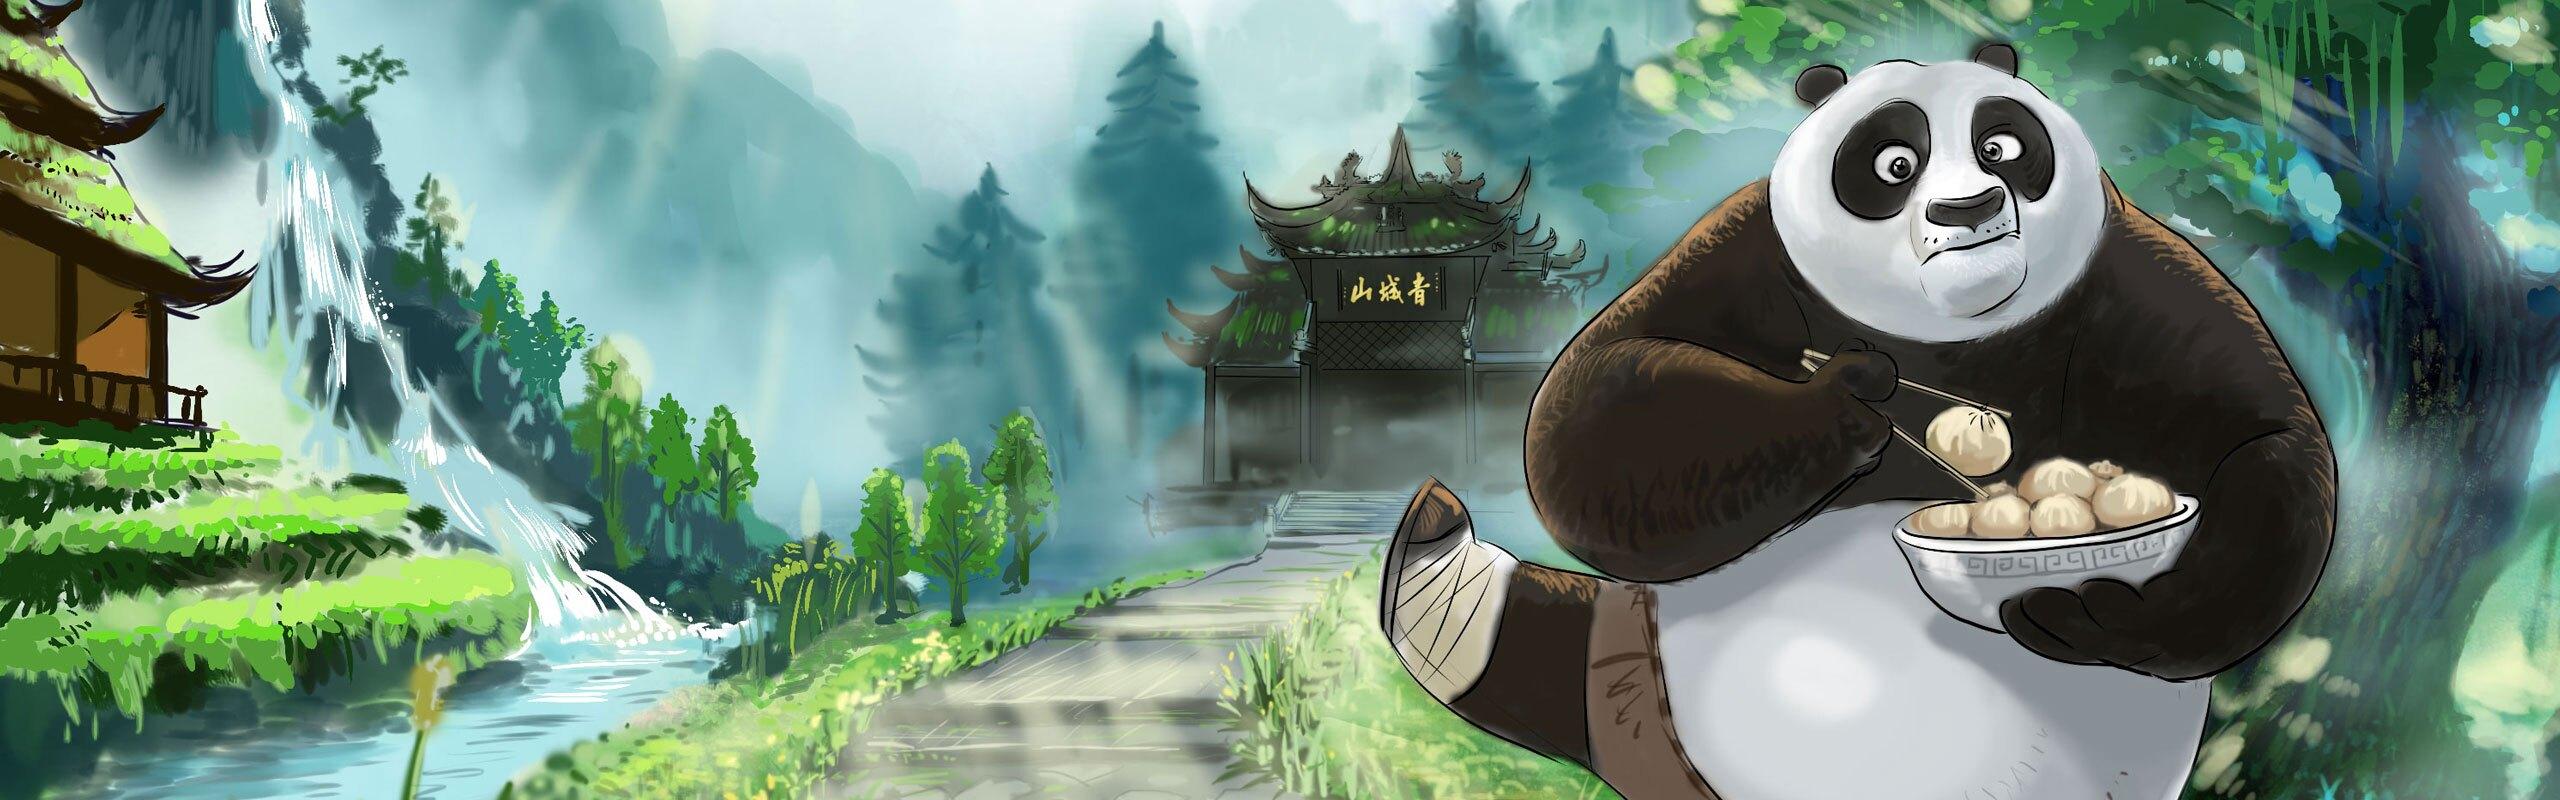 One Day Kung Fu Panda Tour